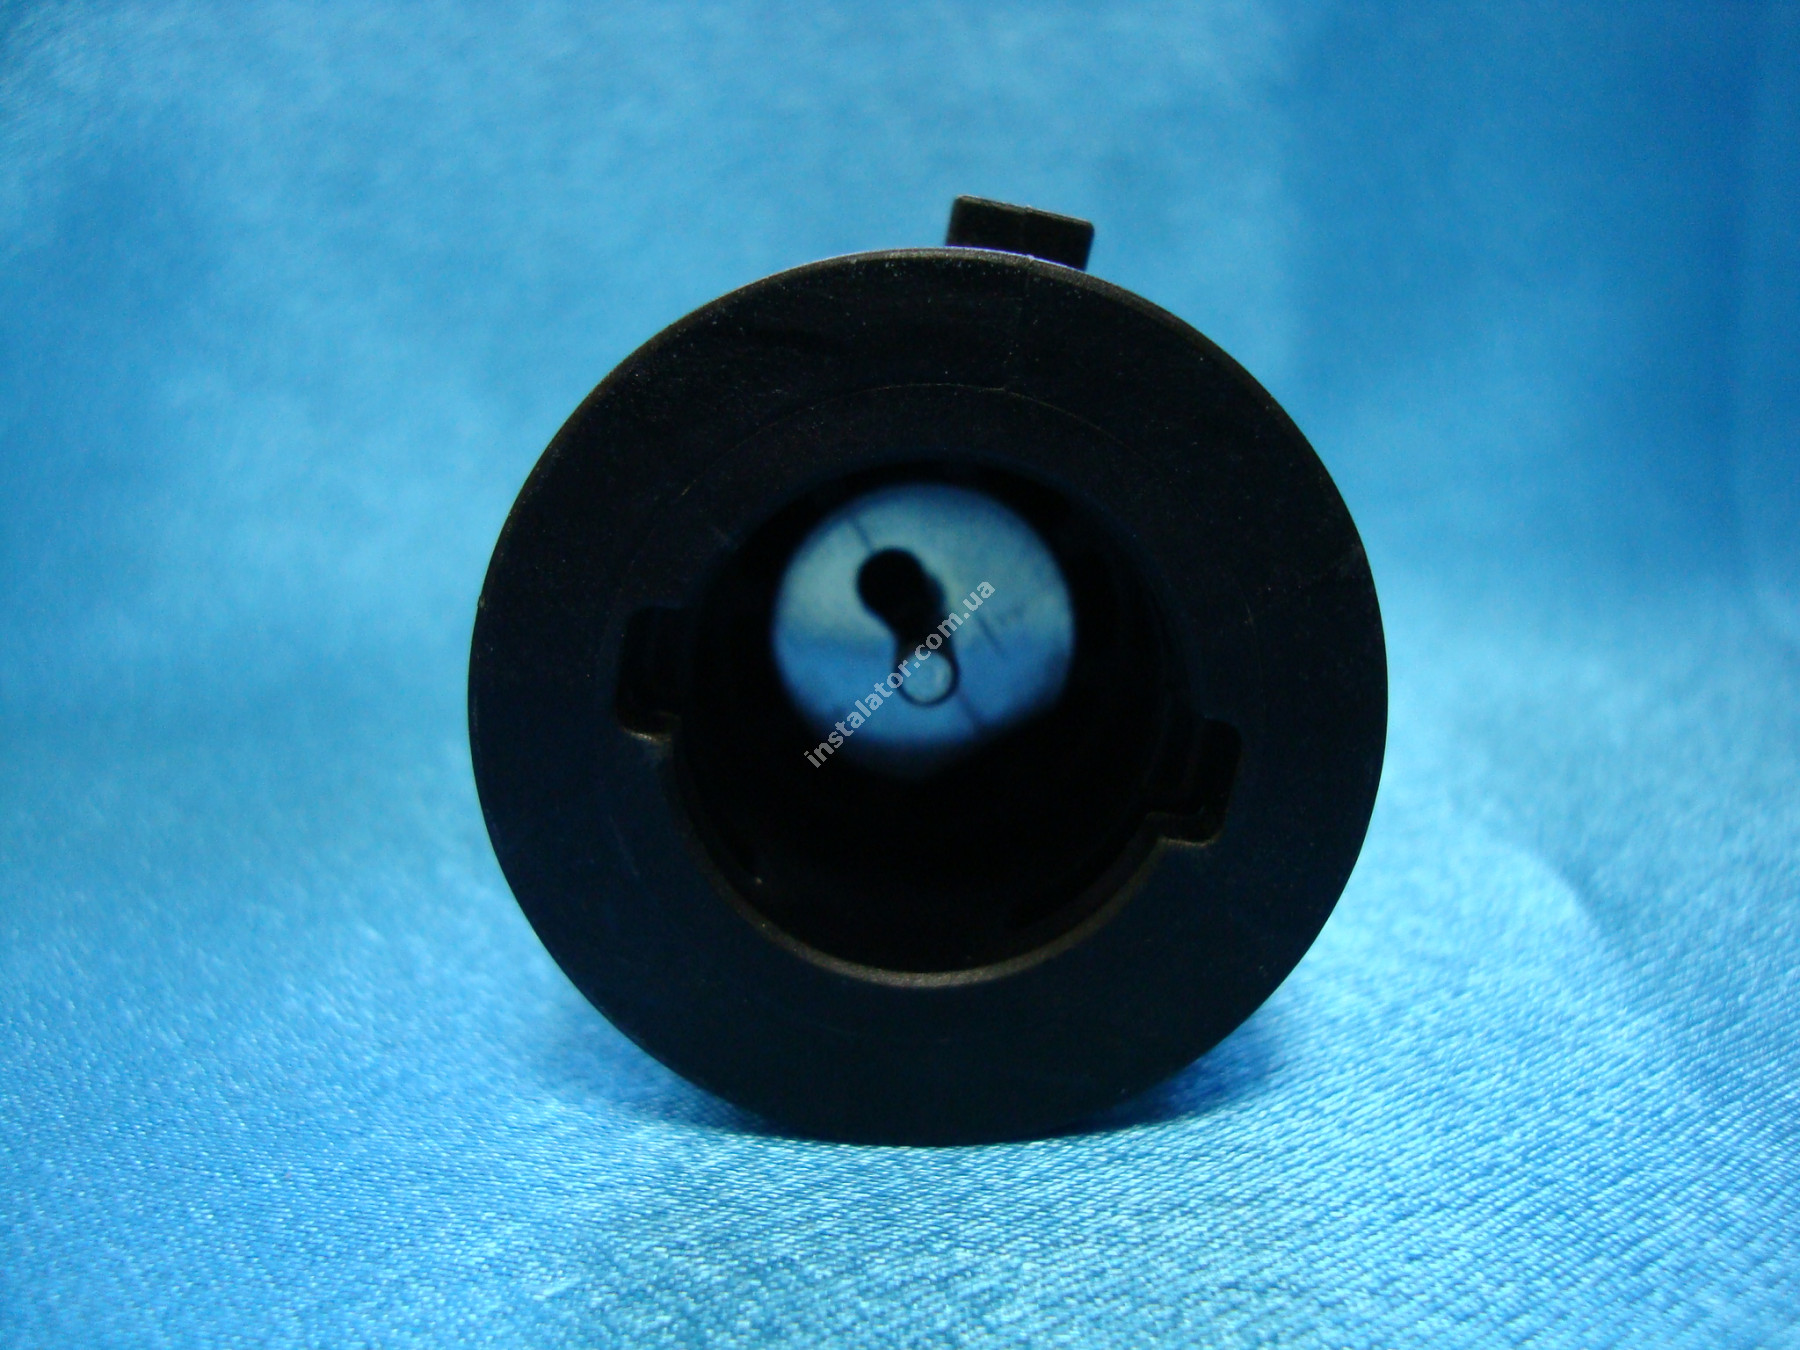 721403800 Картридж 3-х ходового клапана Baxi ECO full-image-2